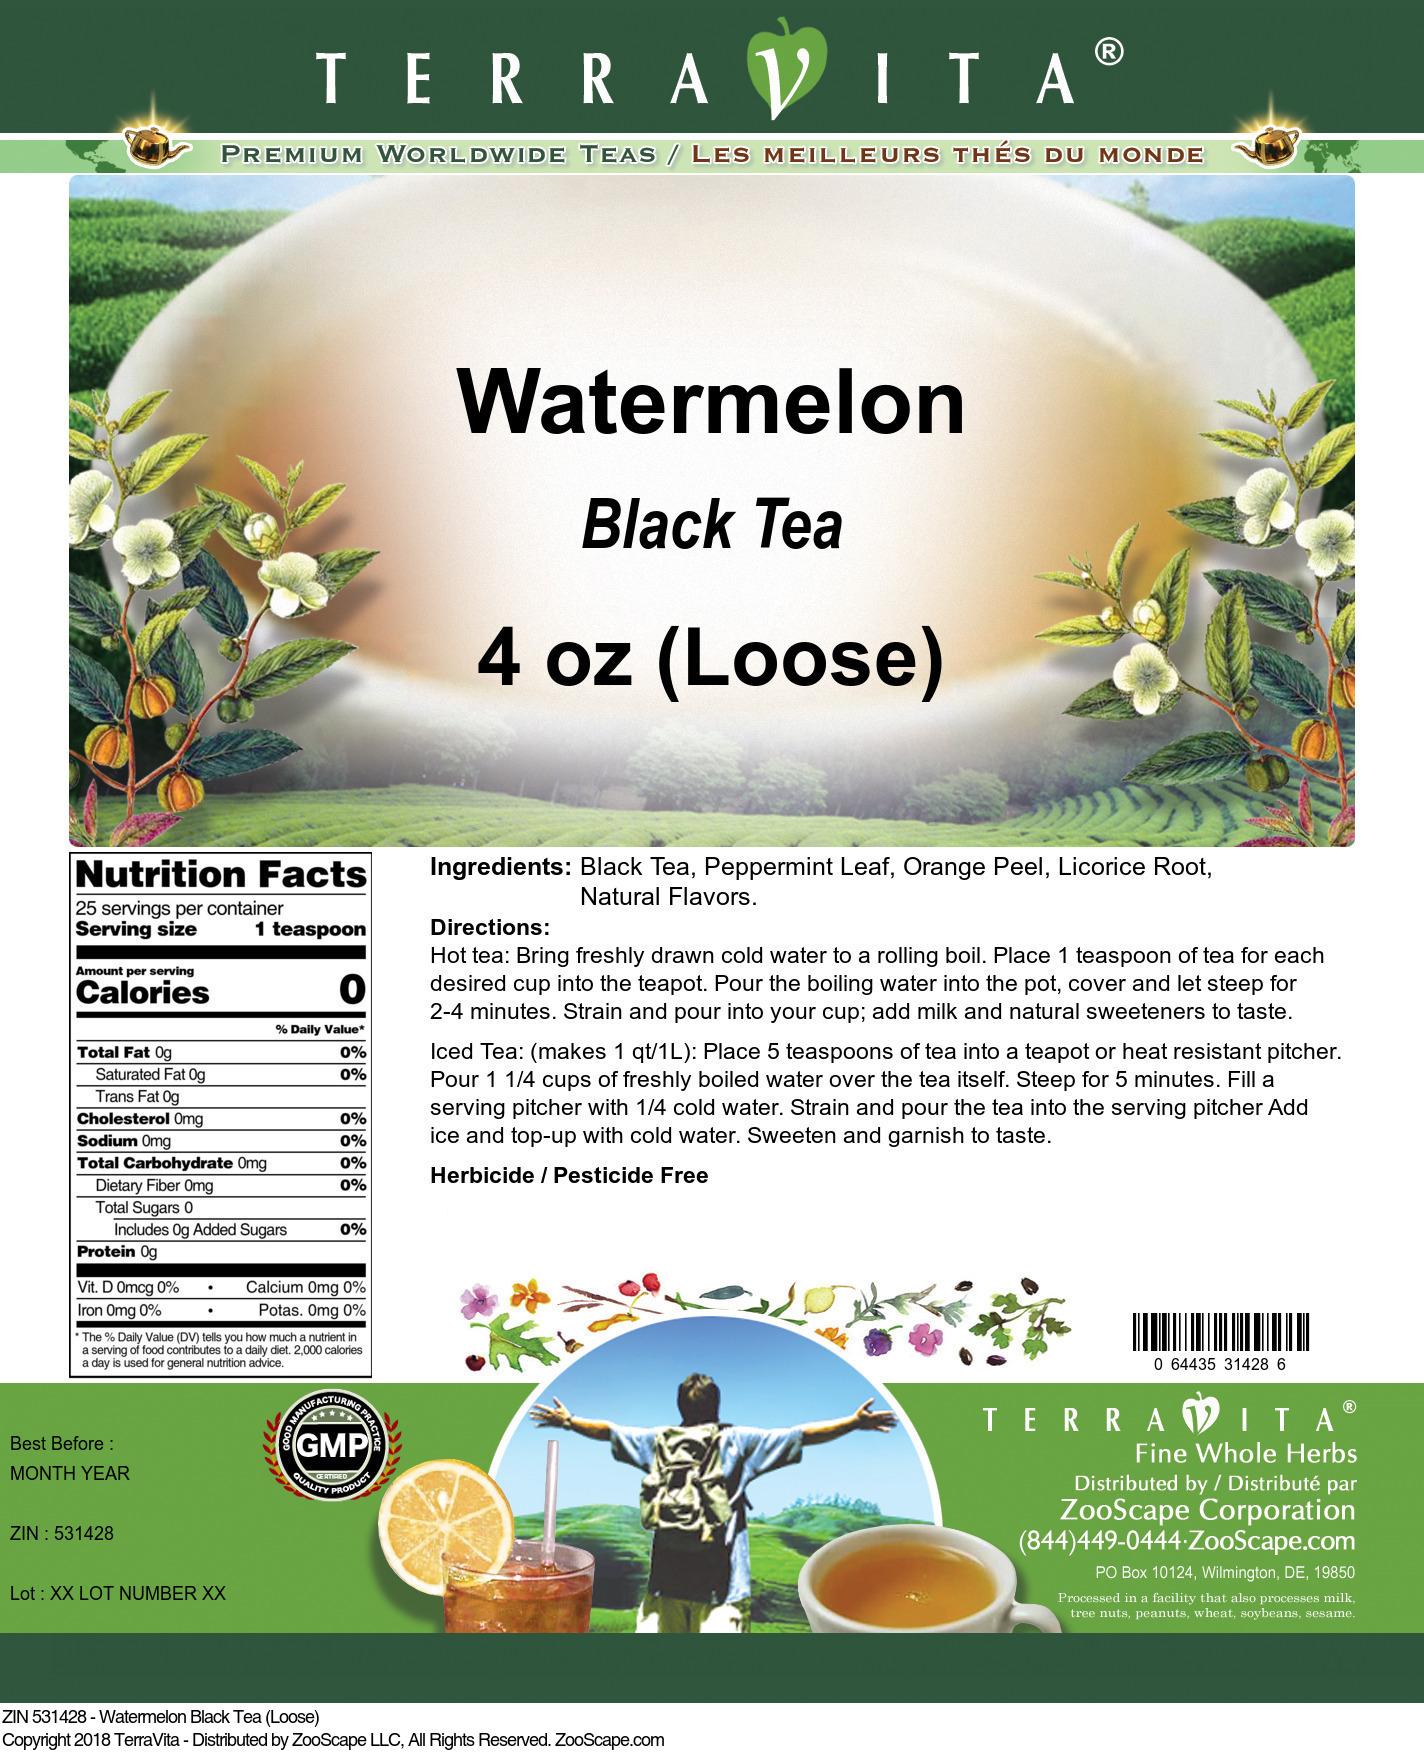 Watermelon Black Tea (Loose)